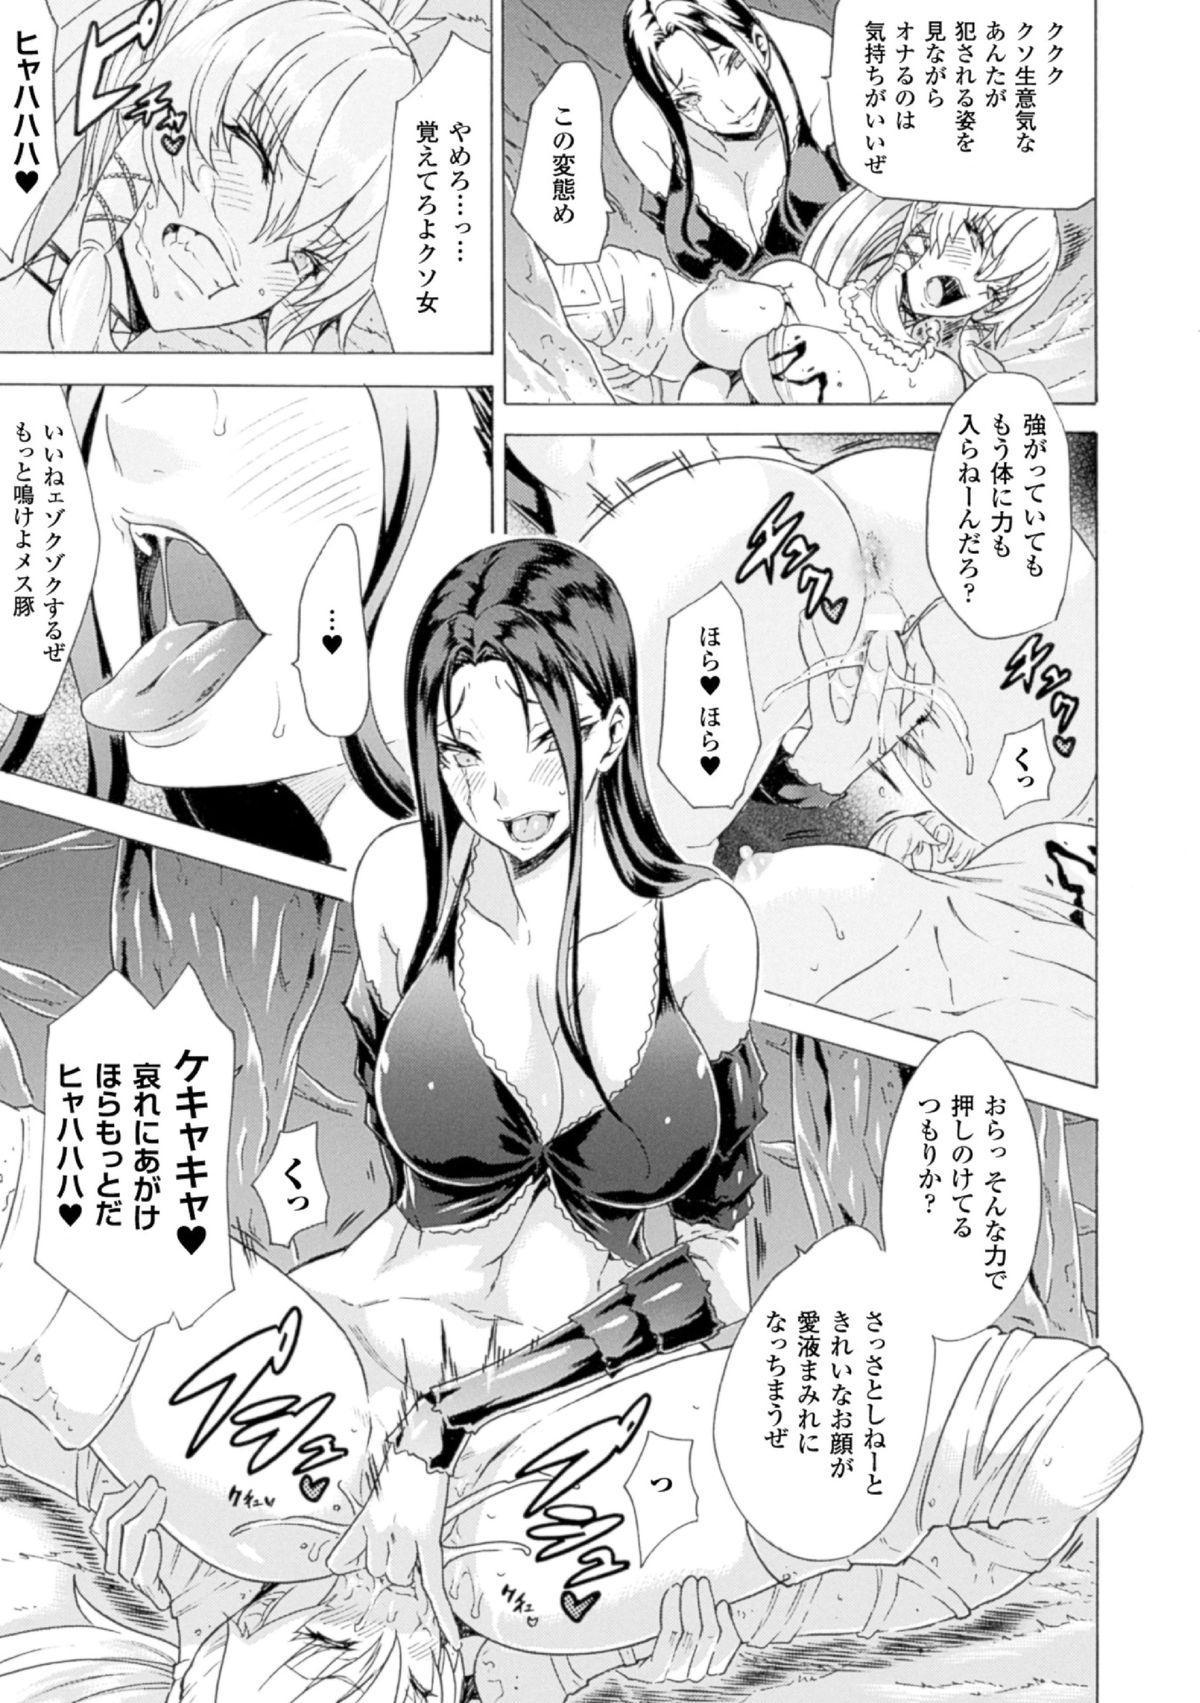 2D Comic Magazine Hunter Heroine AntholoG Vol.1 32